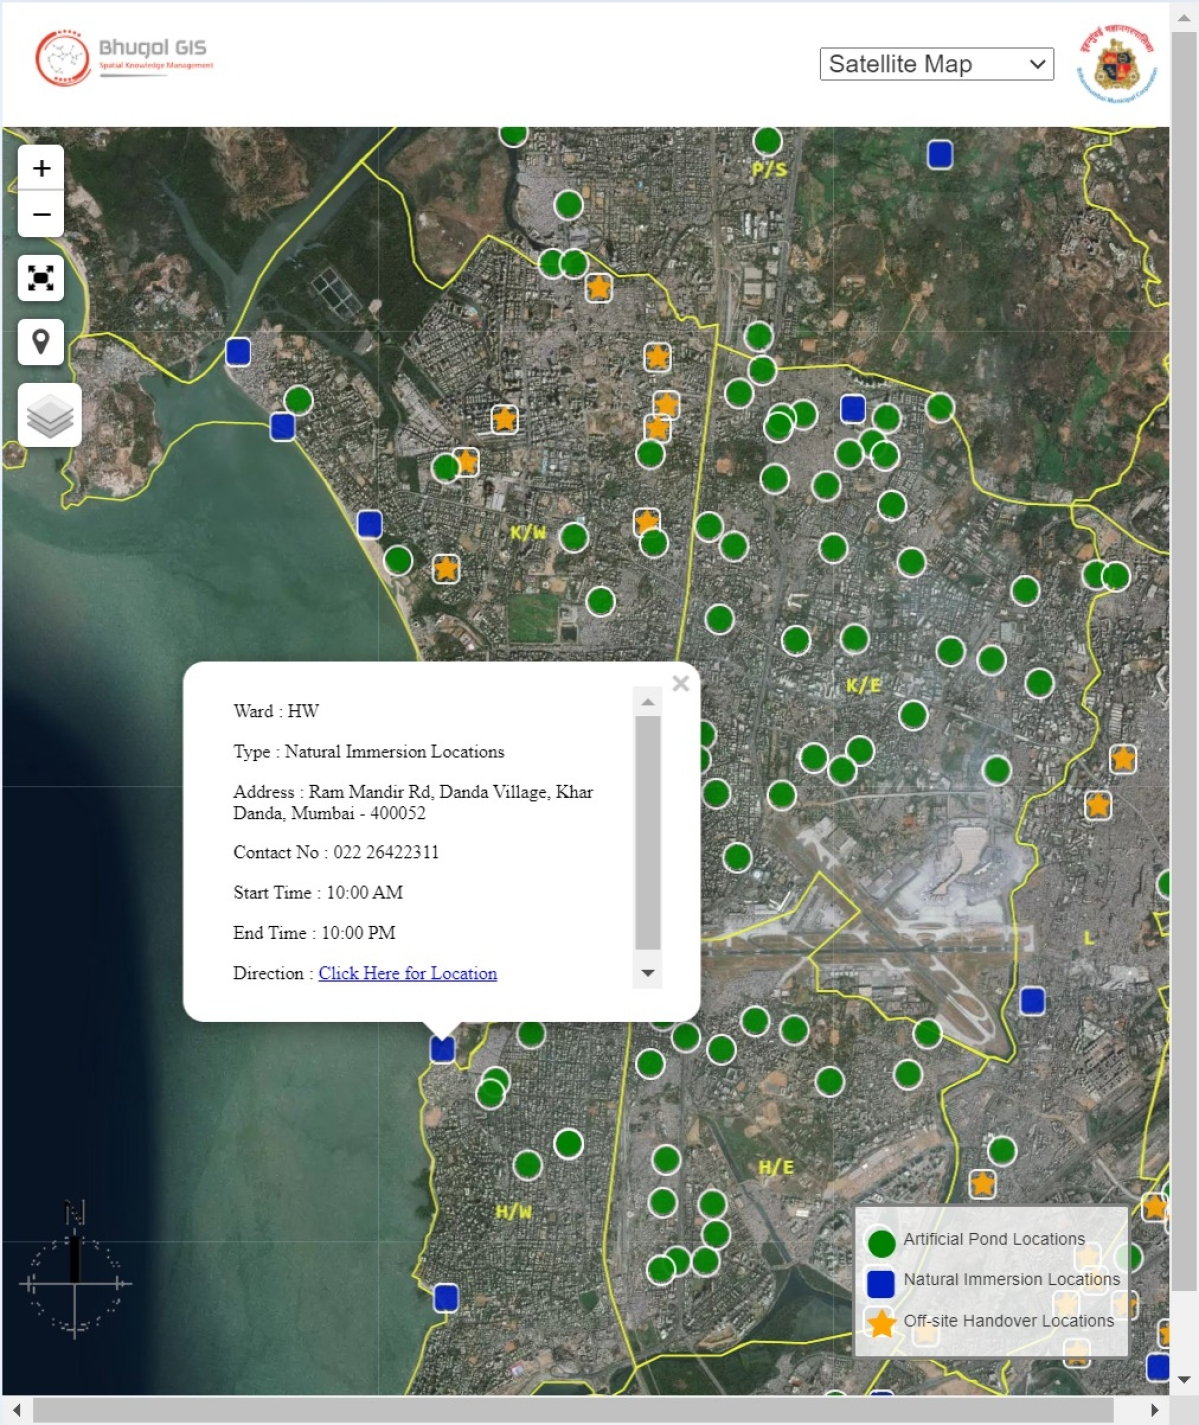 Ganeshotsav in Mumbai: BMC releases map marking locations of immersion sites